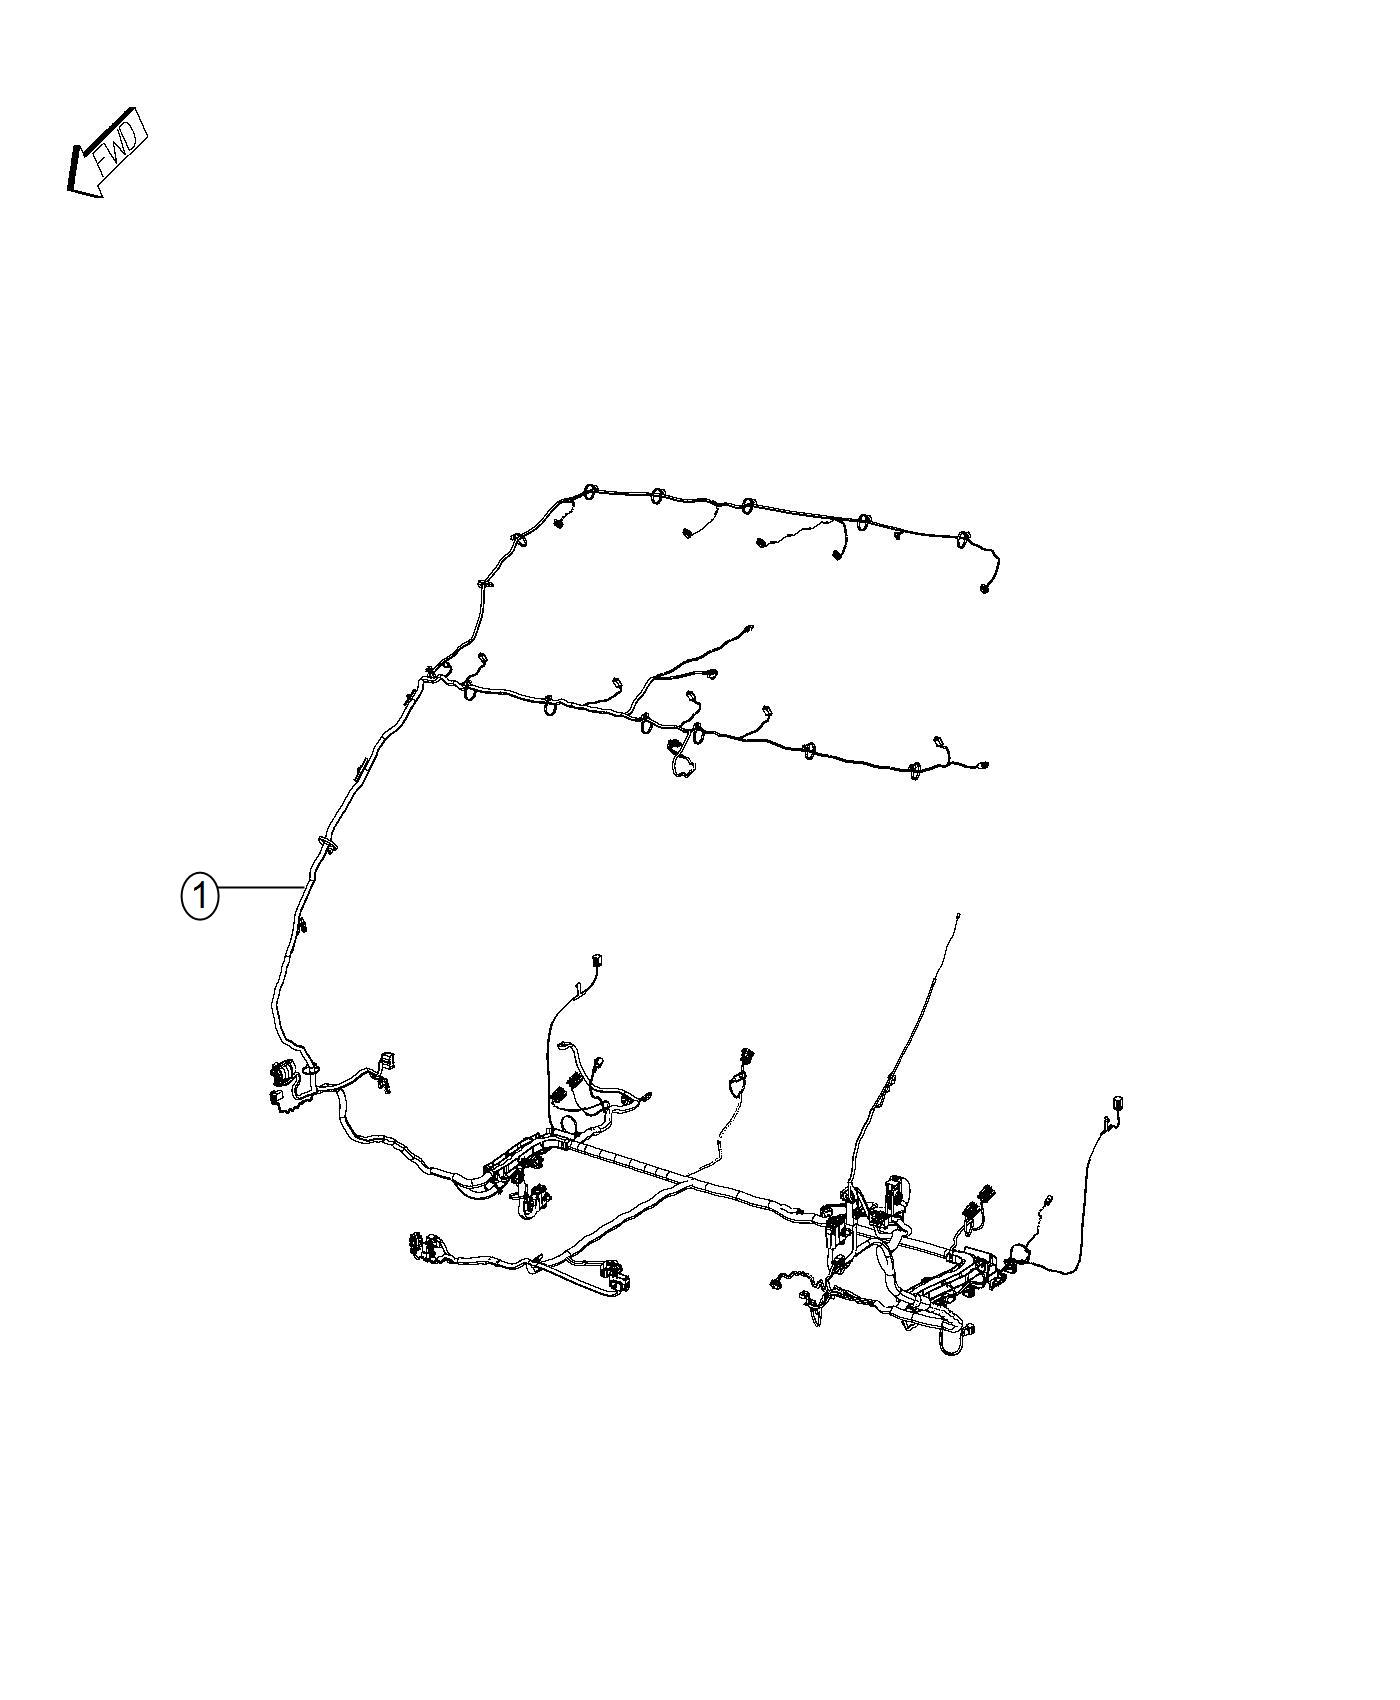 Ram Promaster Wiring Body Interior Delete Passenger